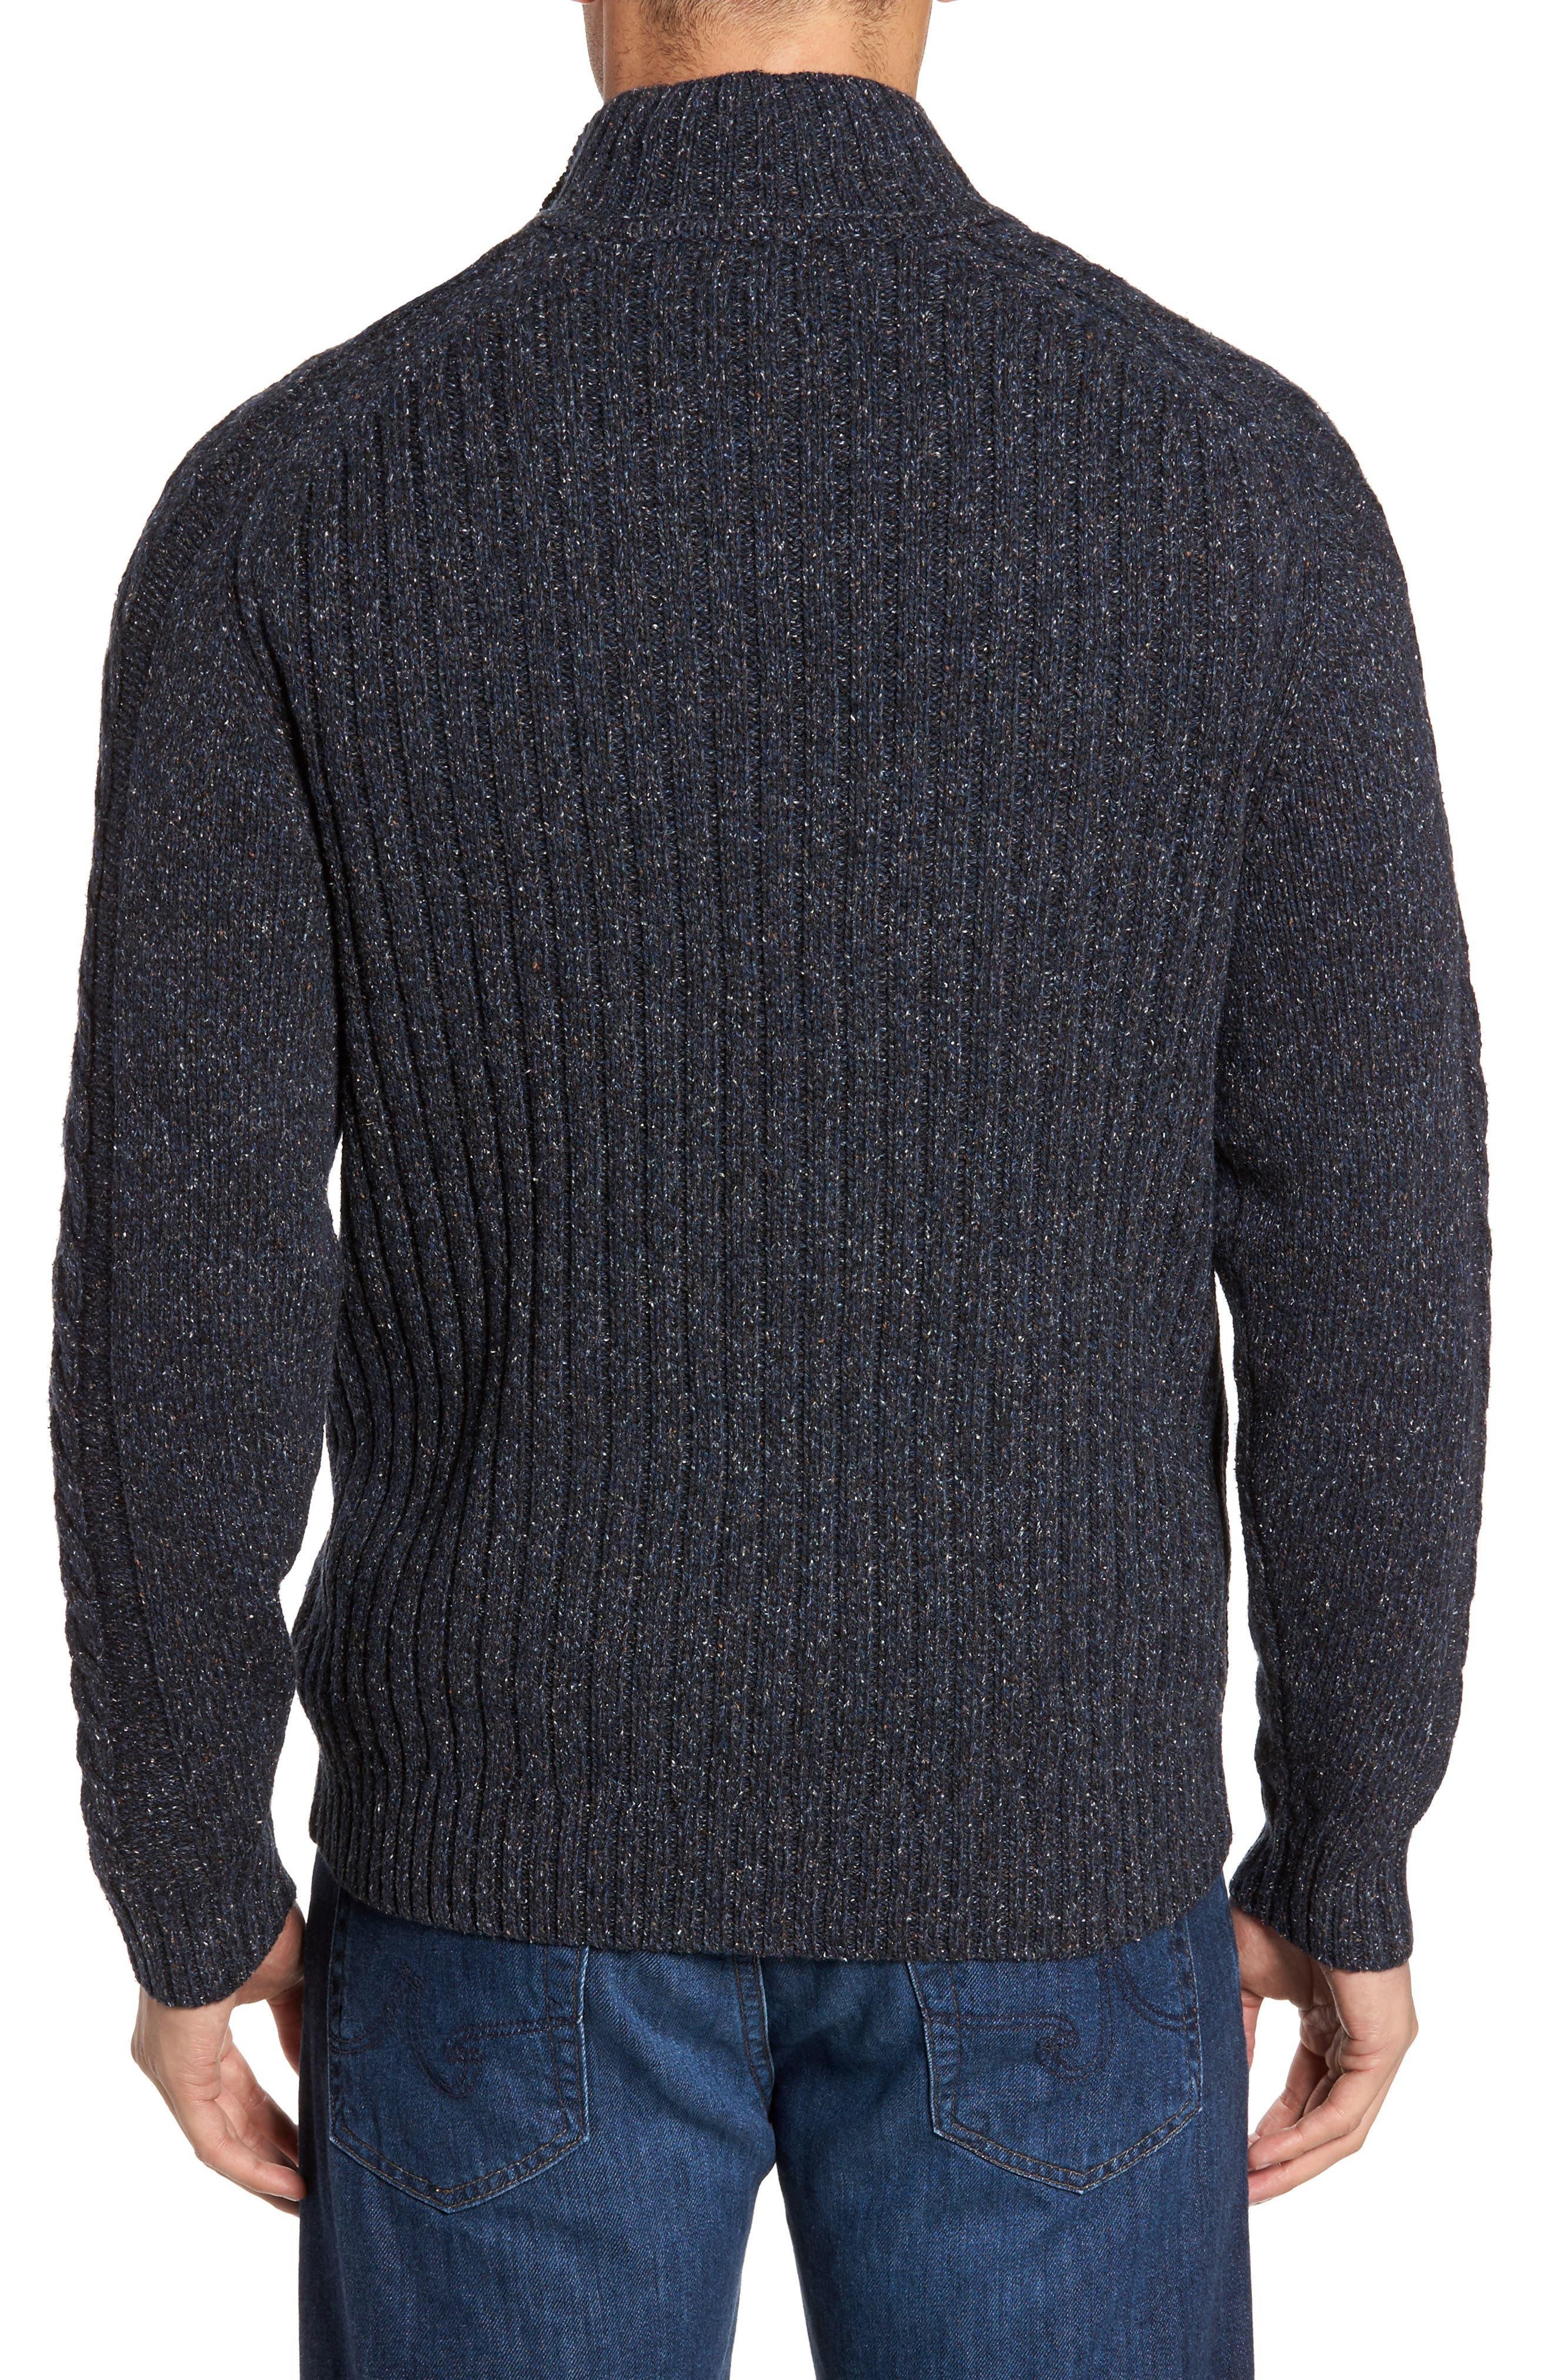 Hamada Quarter Zip Sweater,                             Alternate thumbnail 2, color,                             401